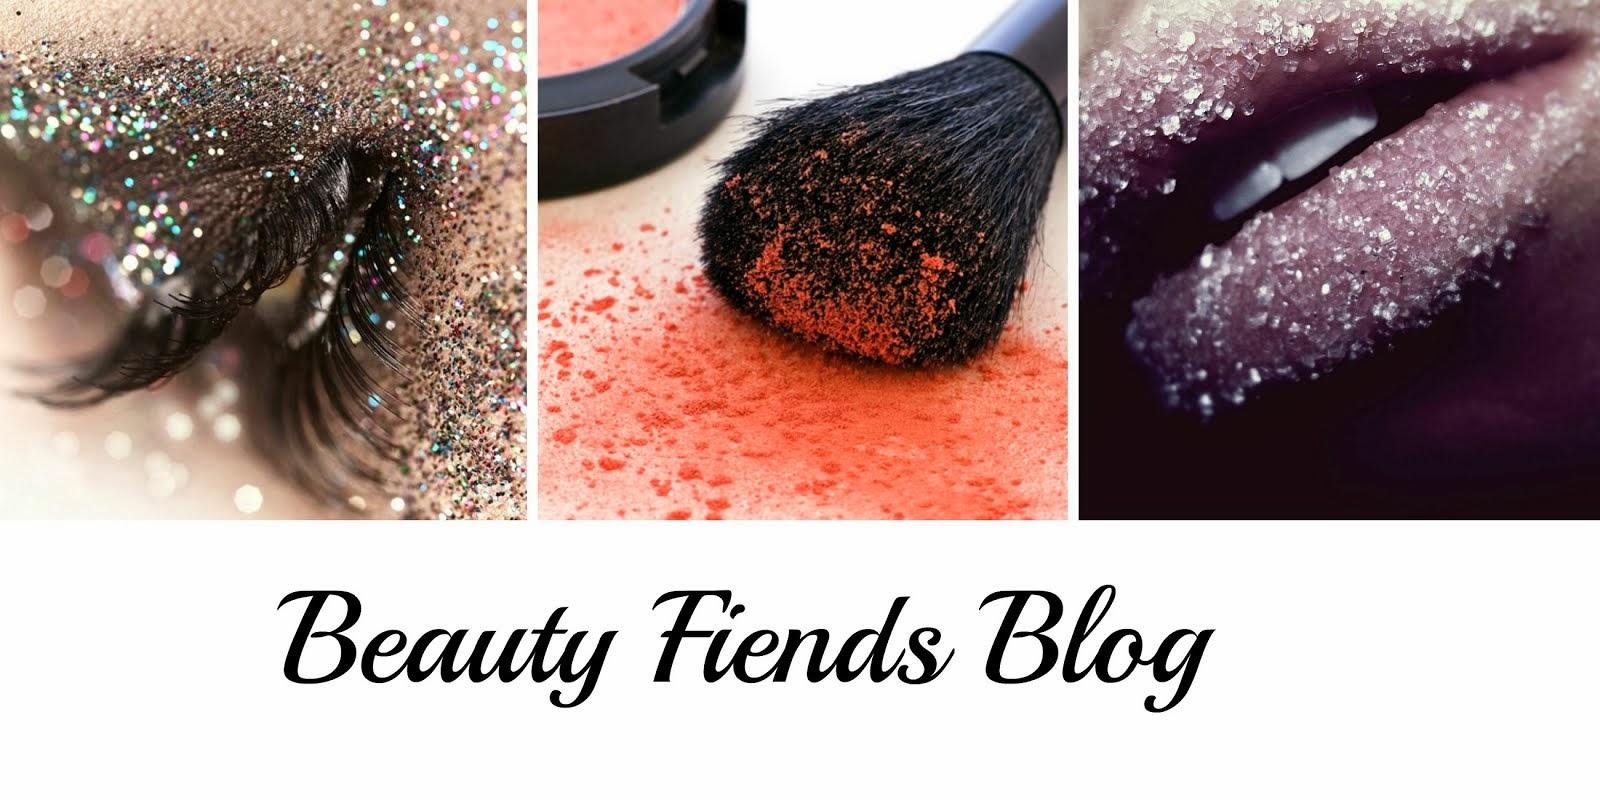 Beauty Fiends Blog